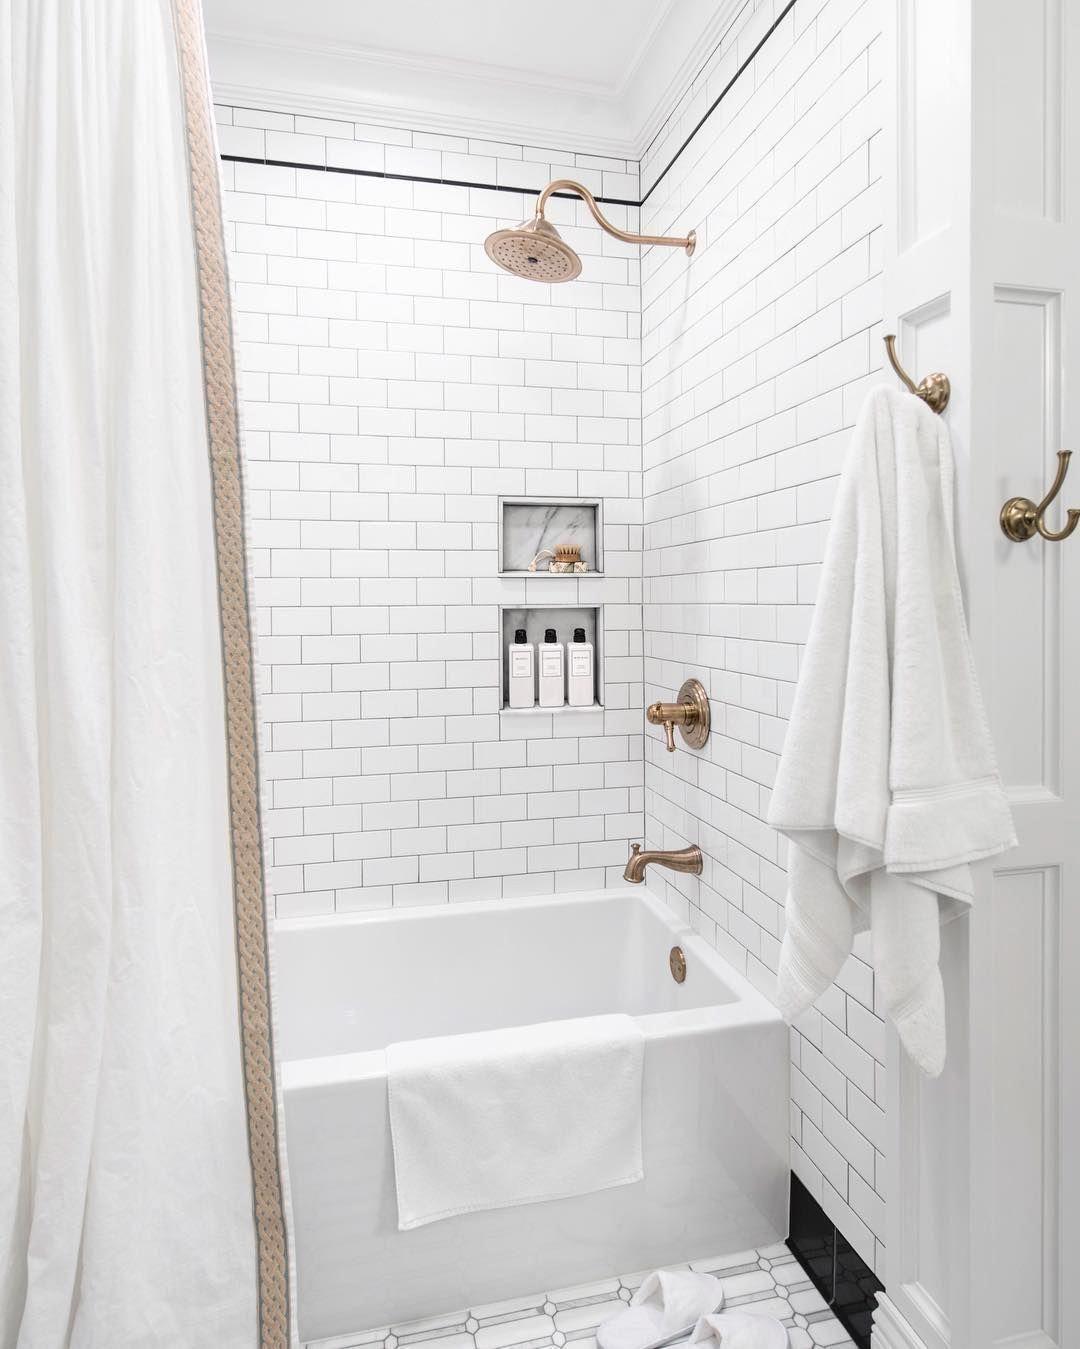 79 Luxury Craftsman Bathroom Design Ideas In 2020 Bathroom